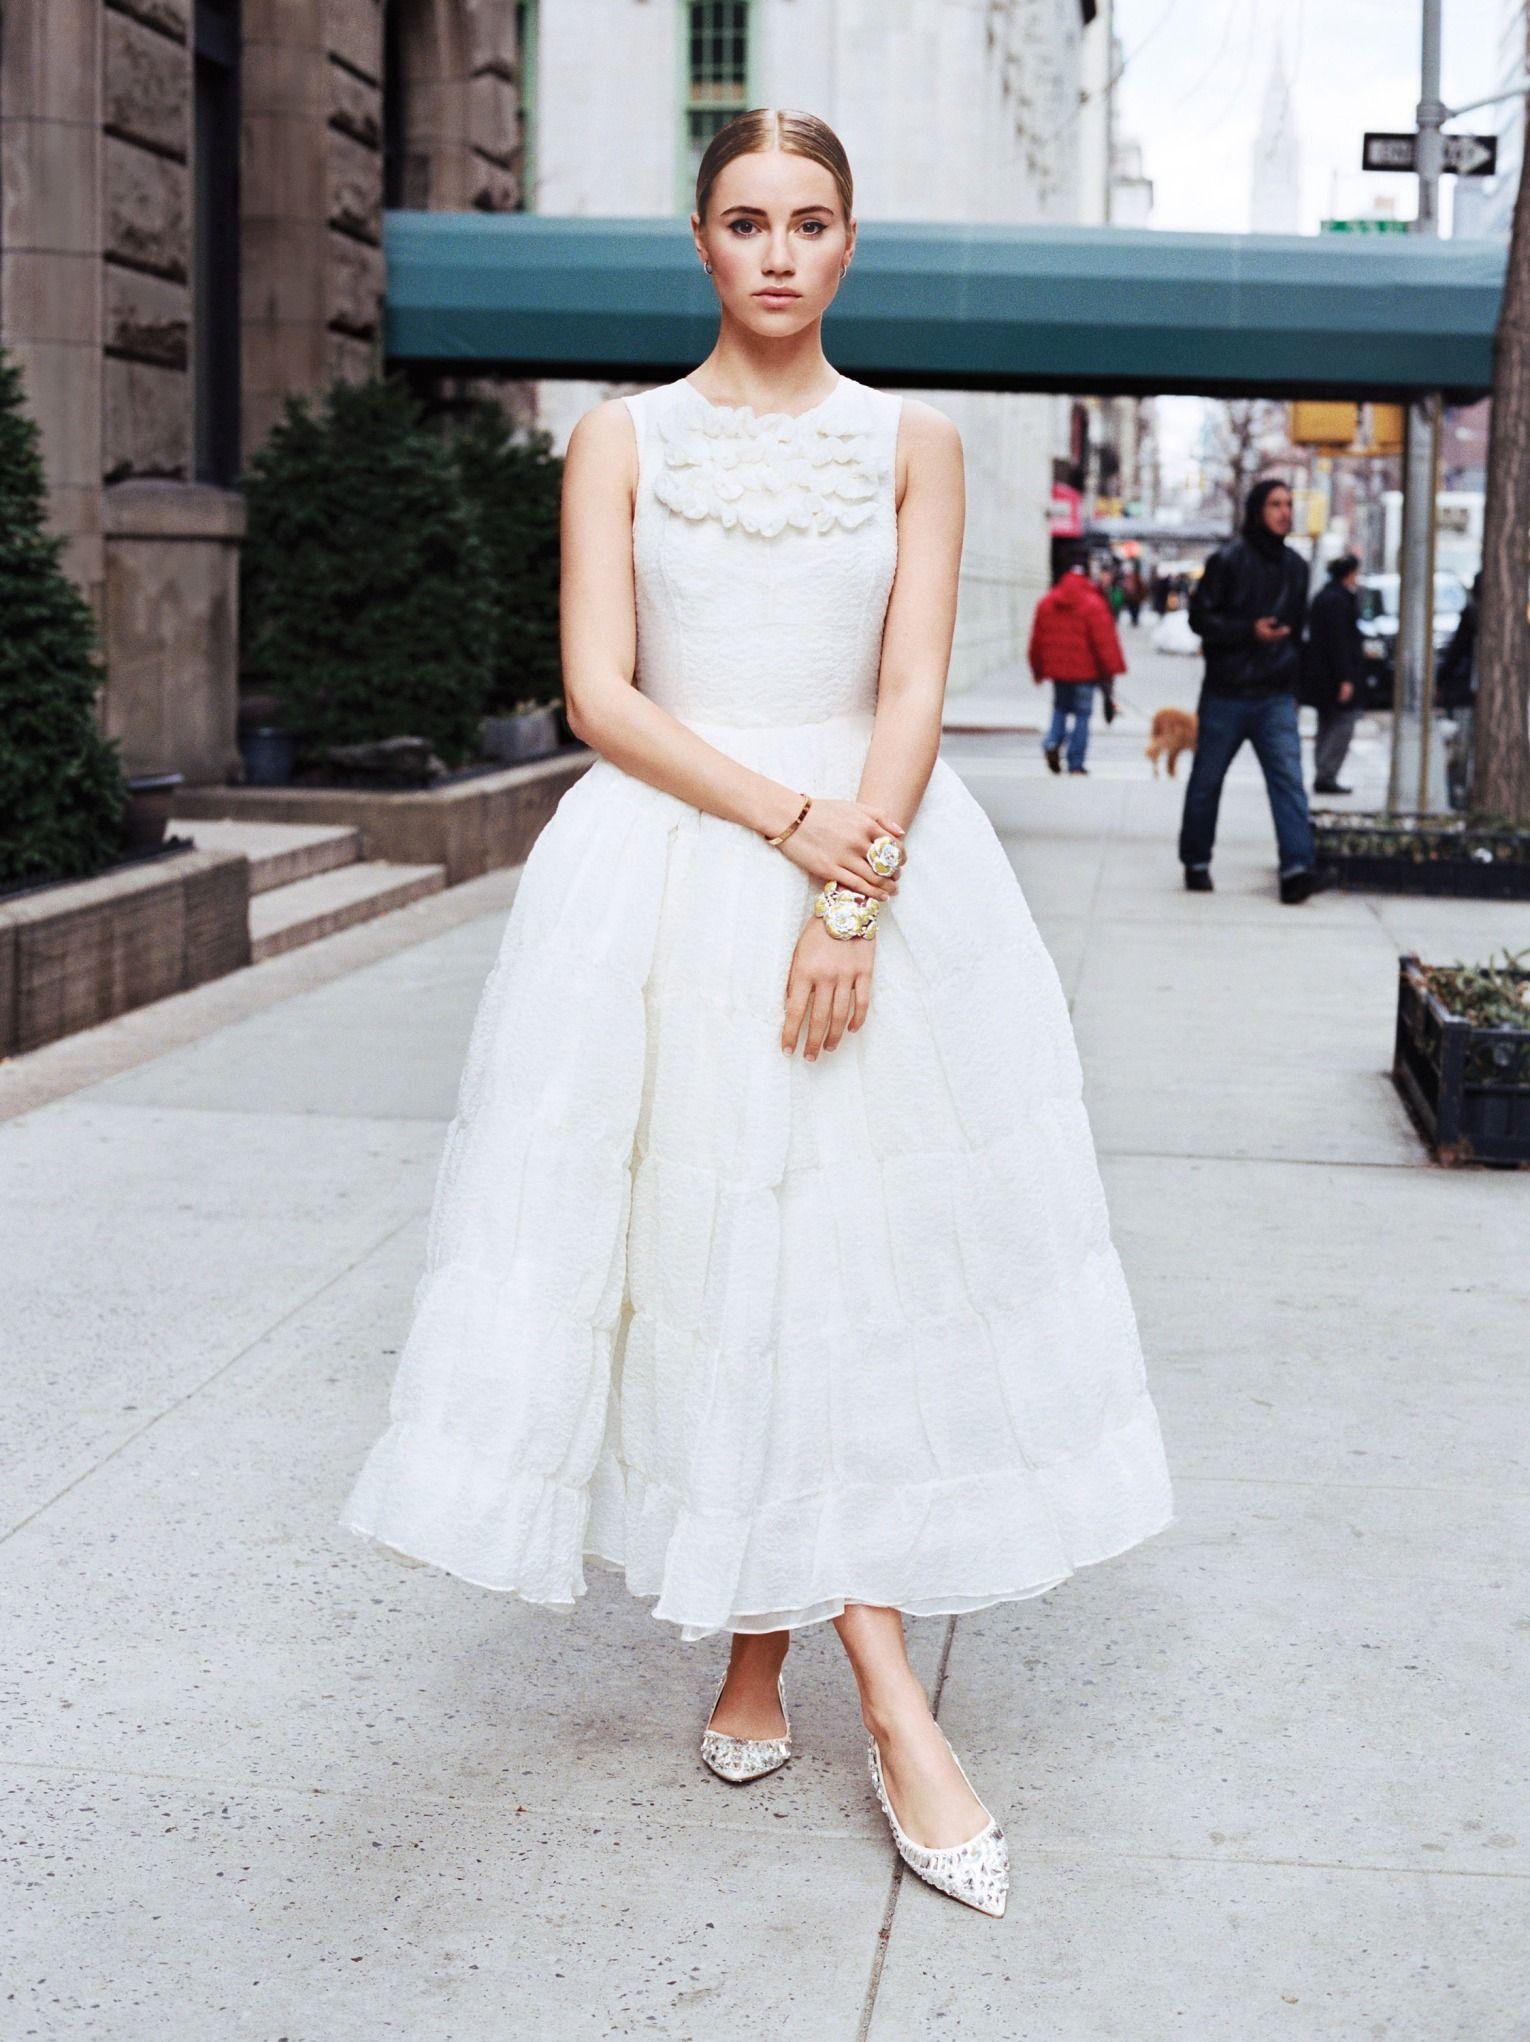 9 Super Chic Flats For Summer Weddings And Beyond Short Wedding Dress Tea Length Wedding Dress Bridal Dresses